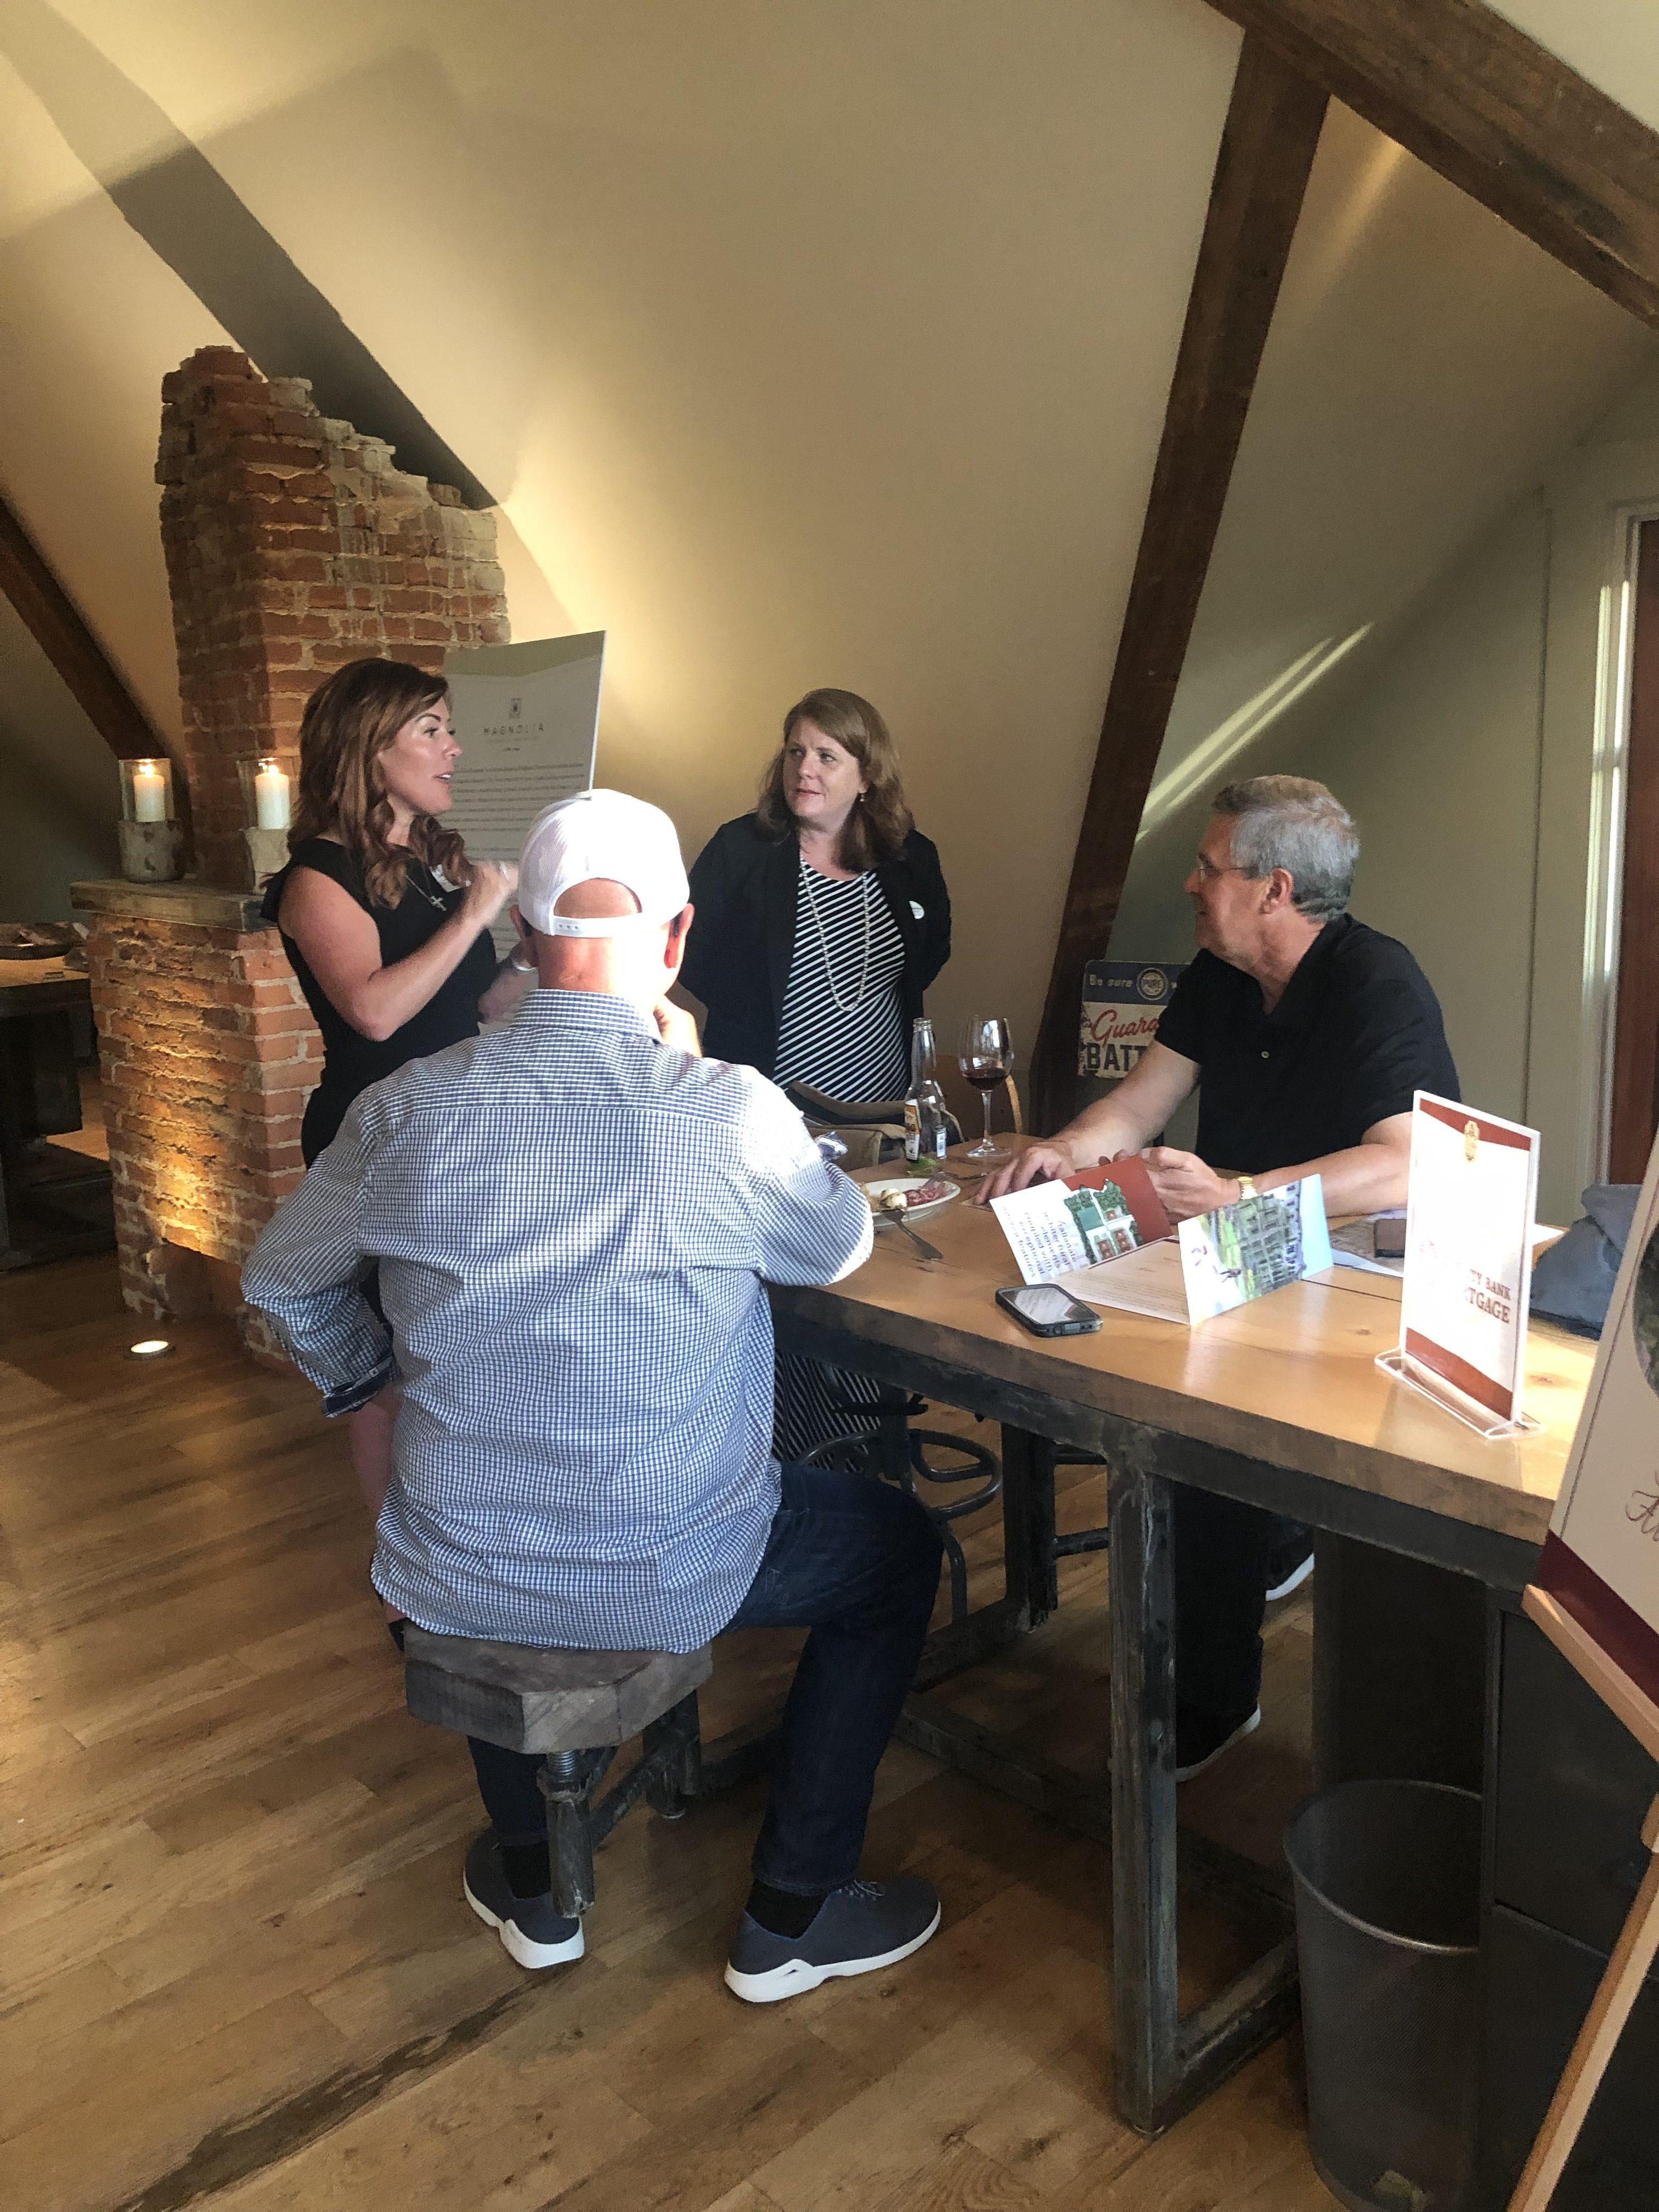 Magnolia Residential Hosts Events at New Alpharetta Community